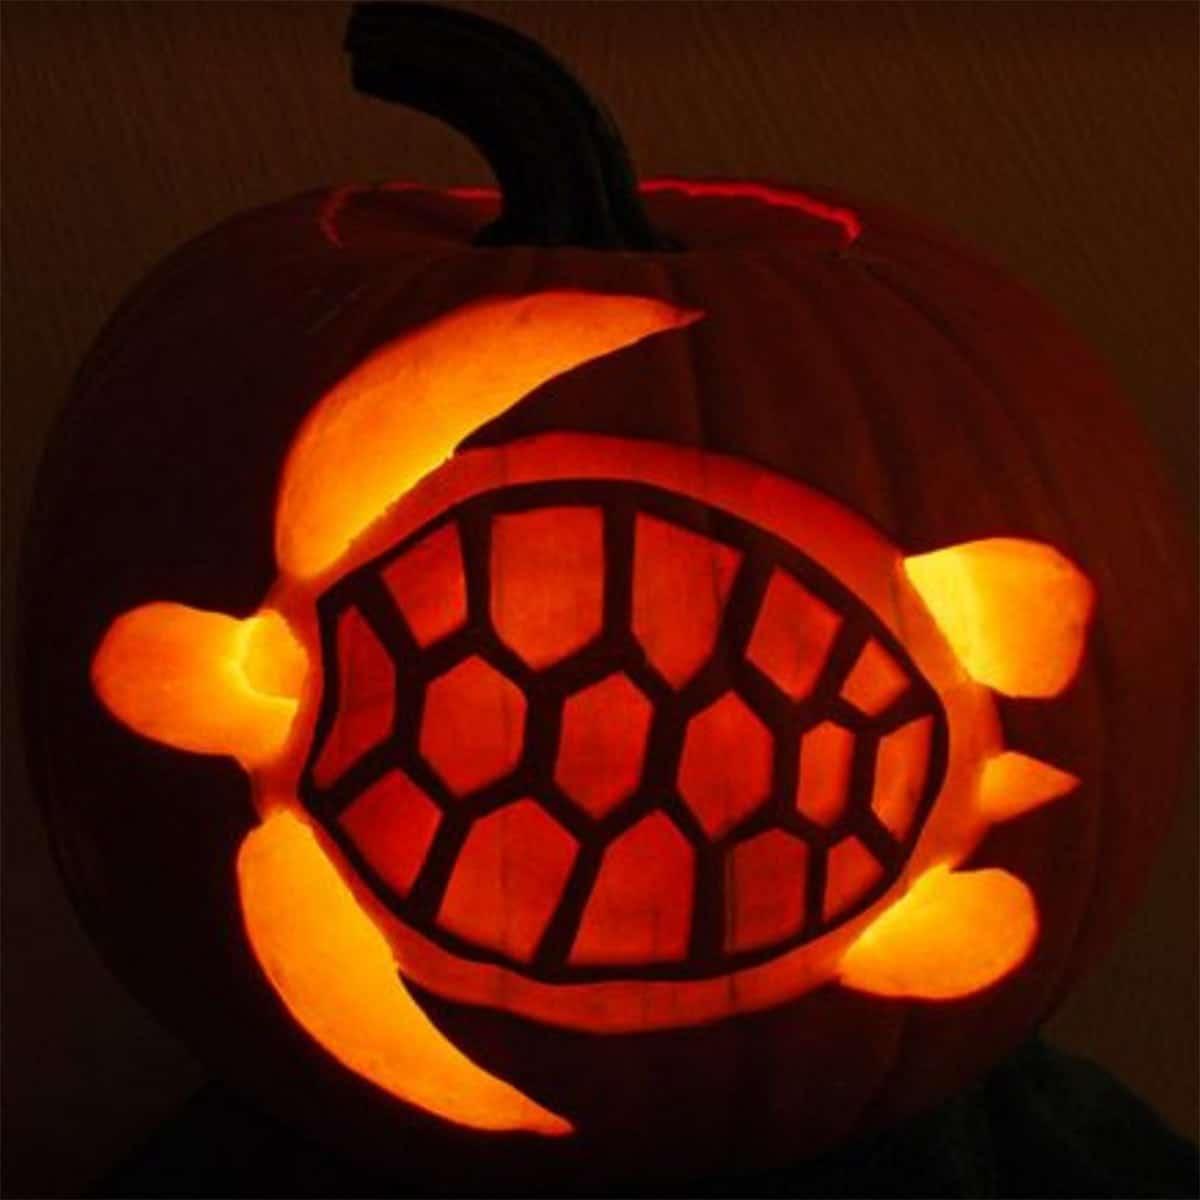 turtle pumpkin carving